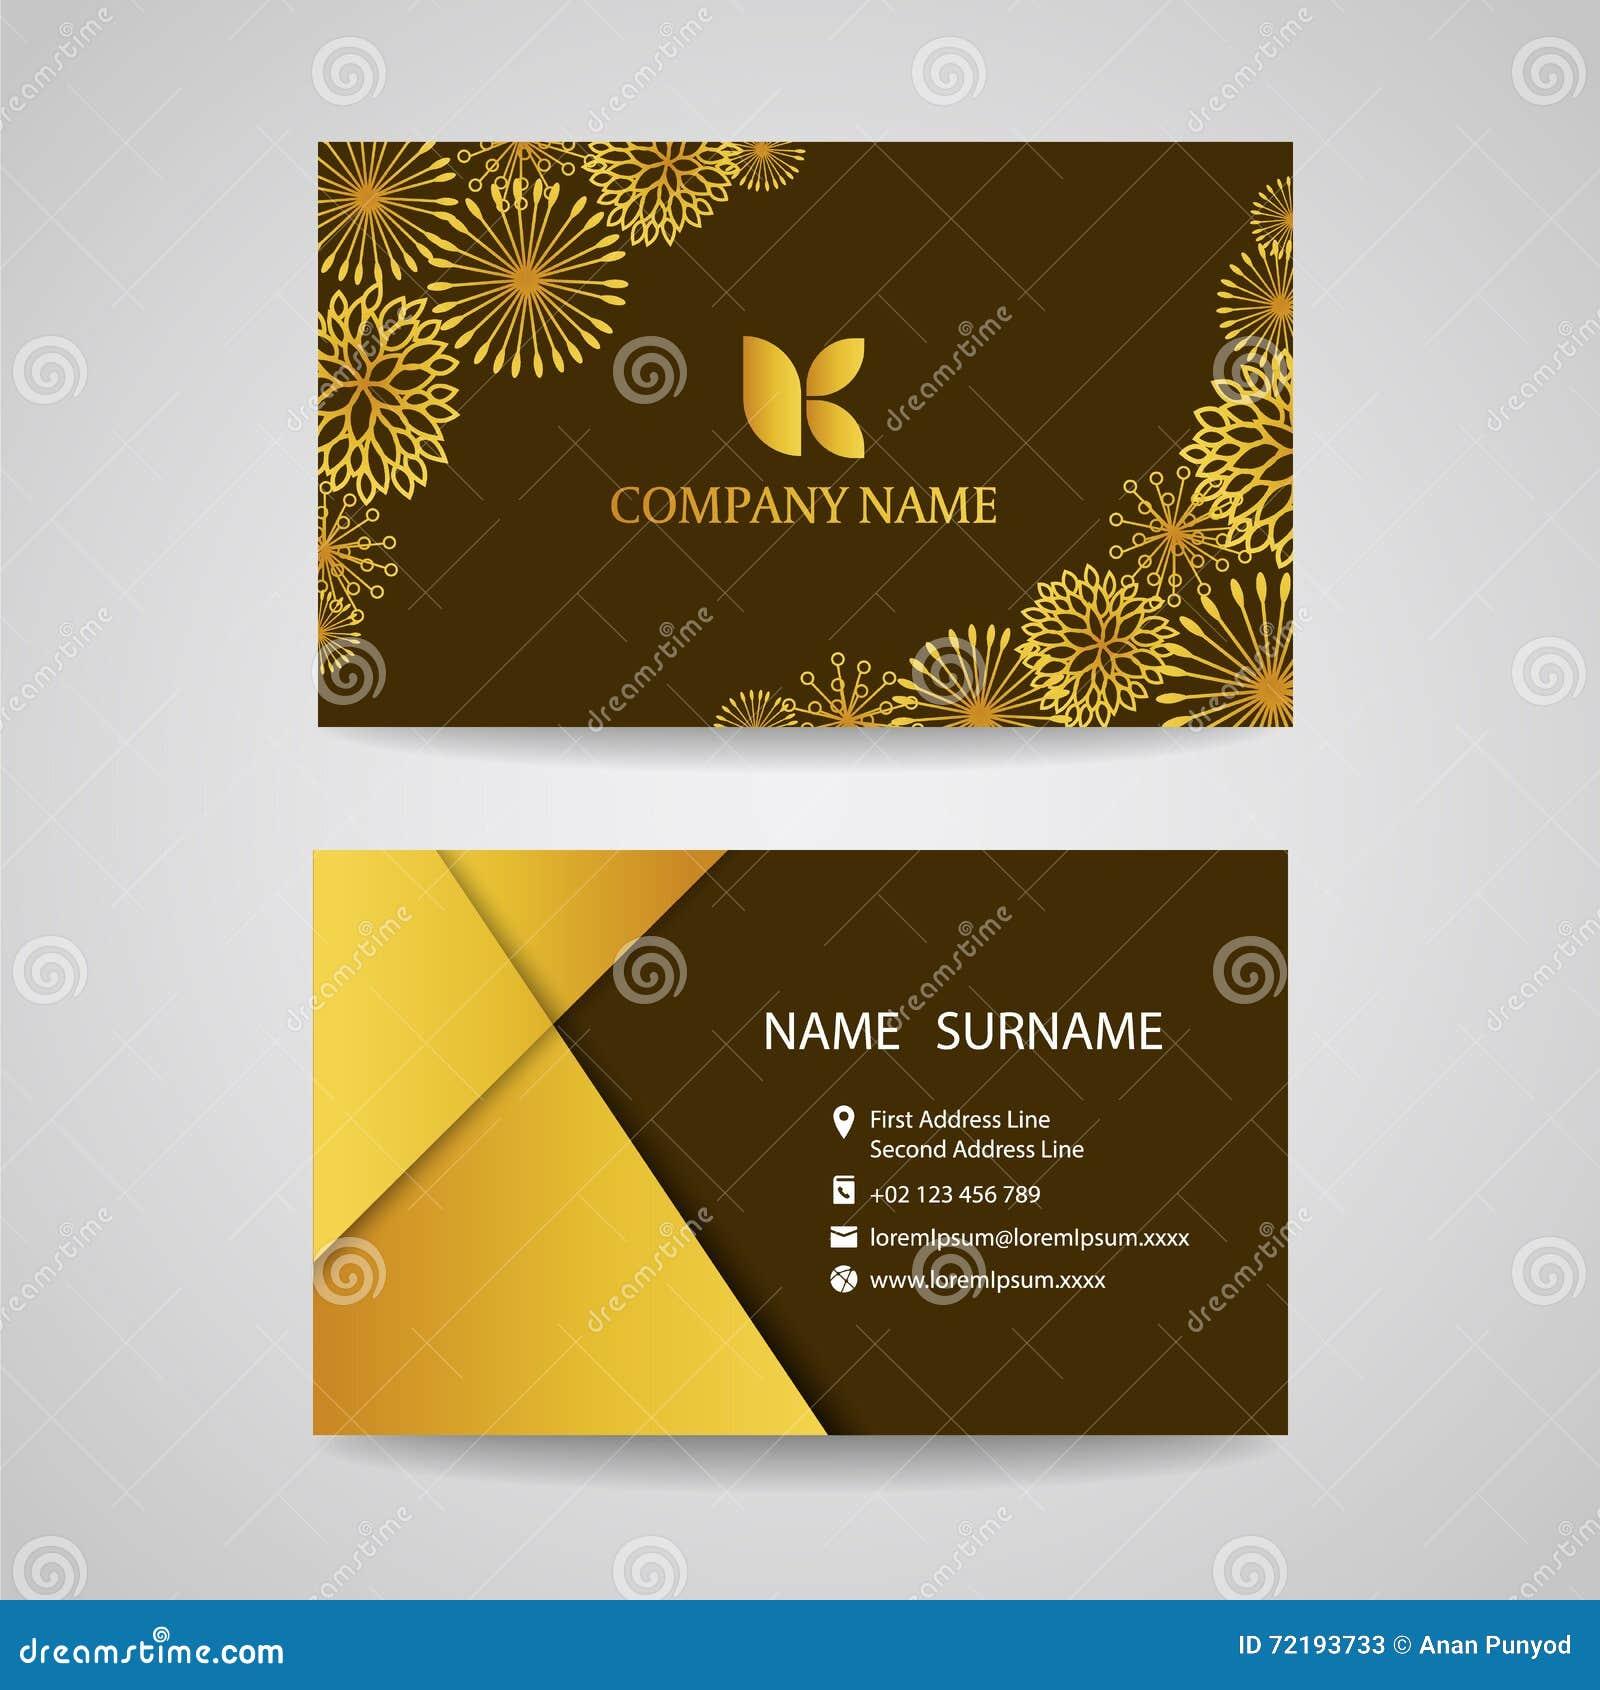 Visitenkarte Goldblumenrahmen Auf Braunem